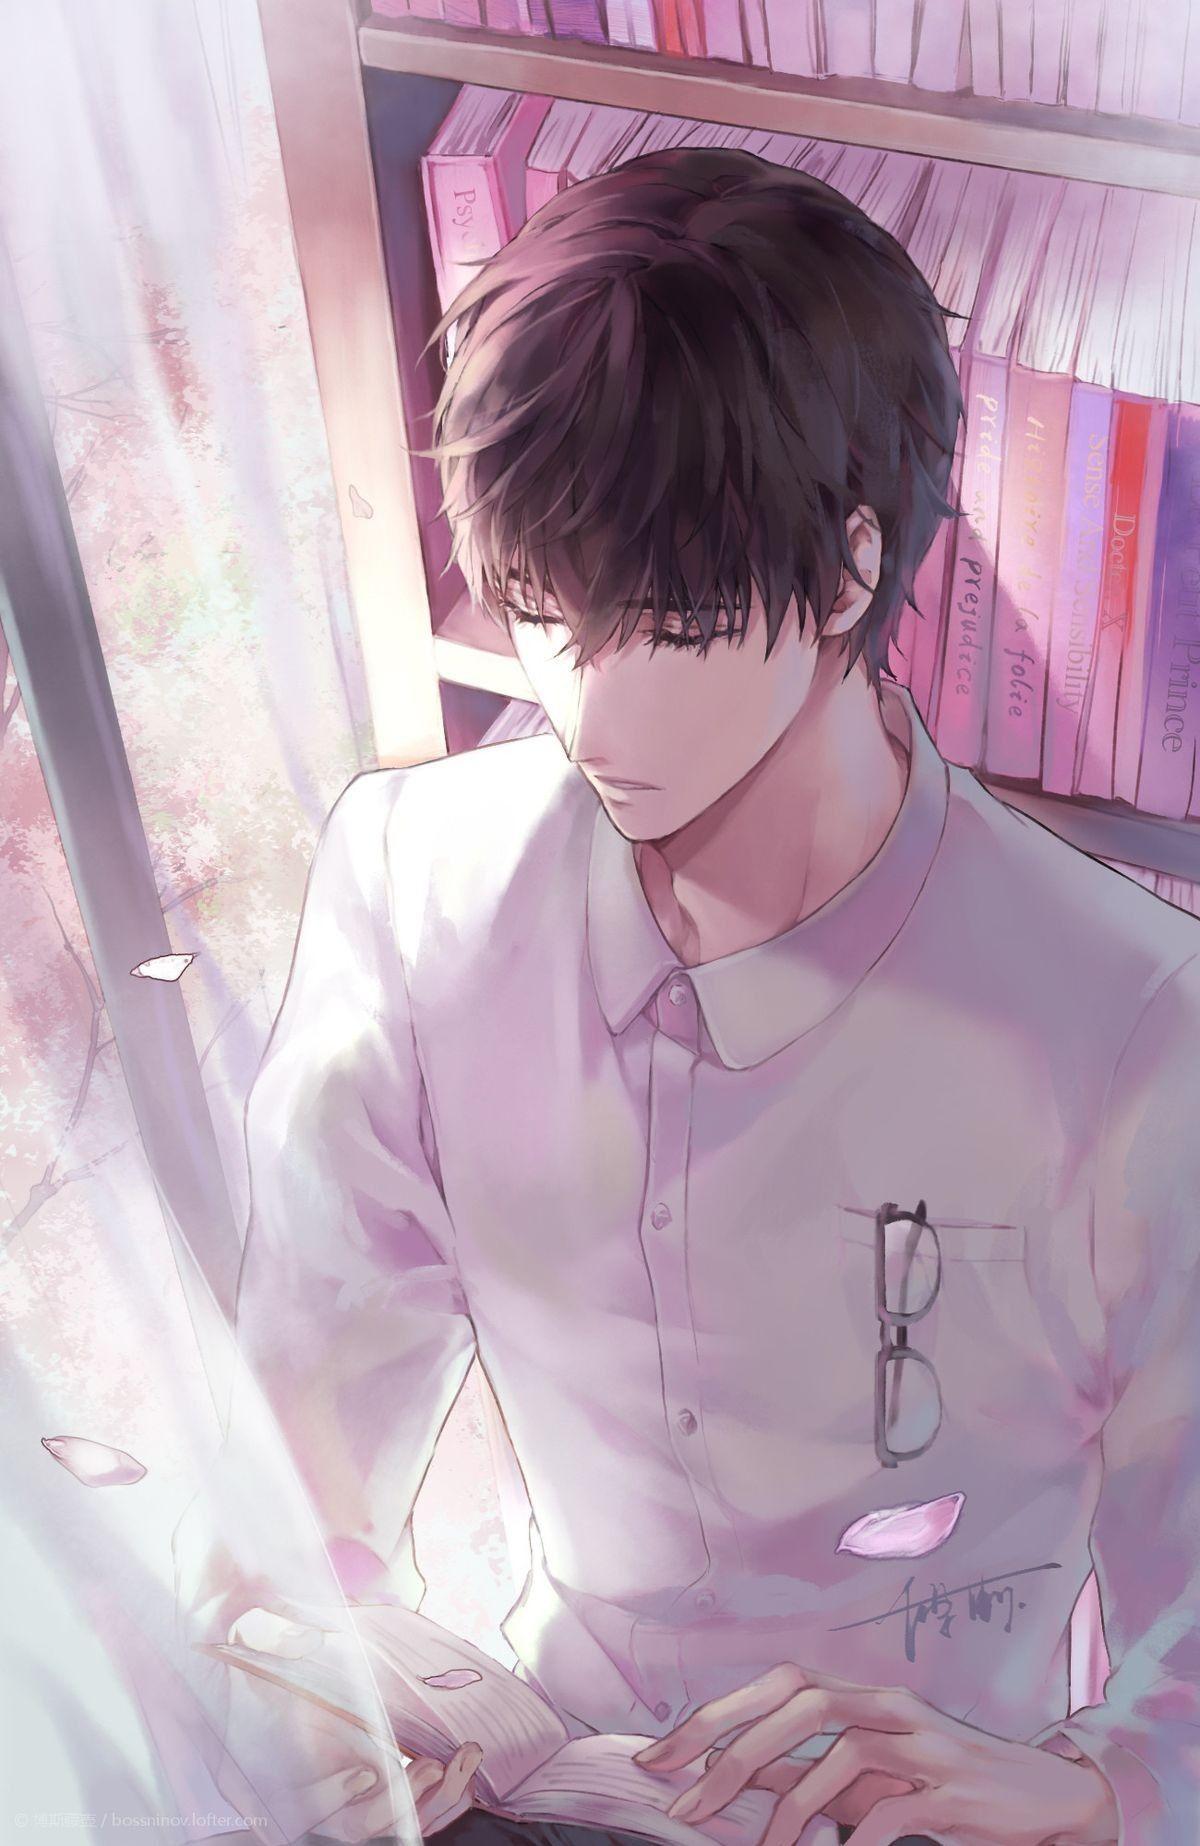 Just So Handsome Handsome Anime Handsome Anime Guys Cute Anime Boy